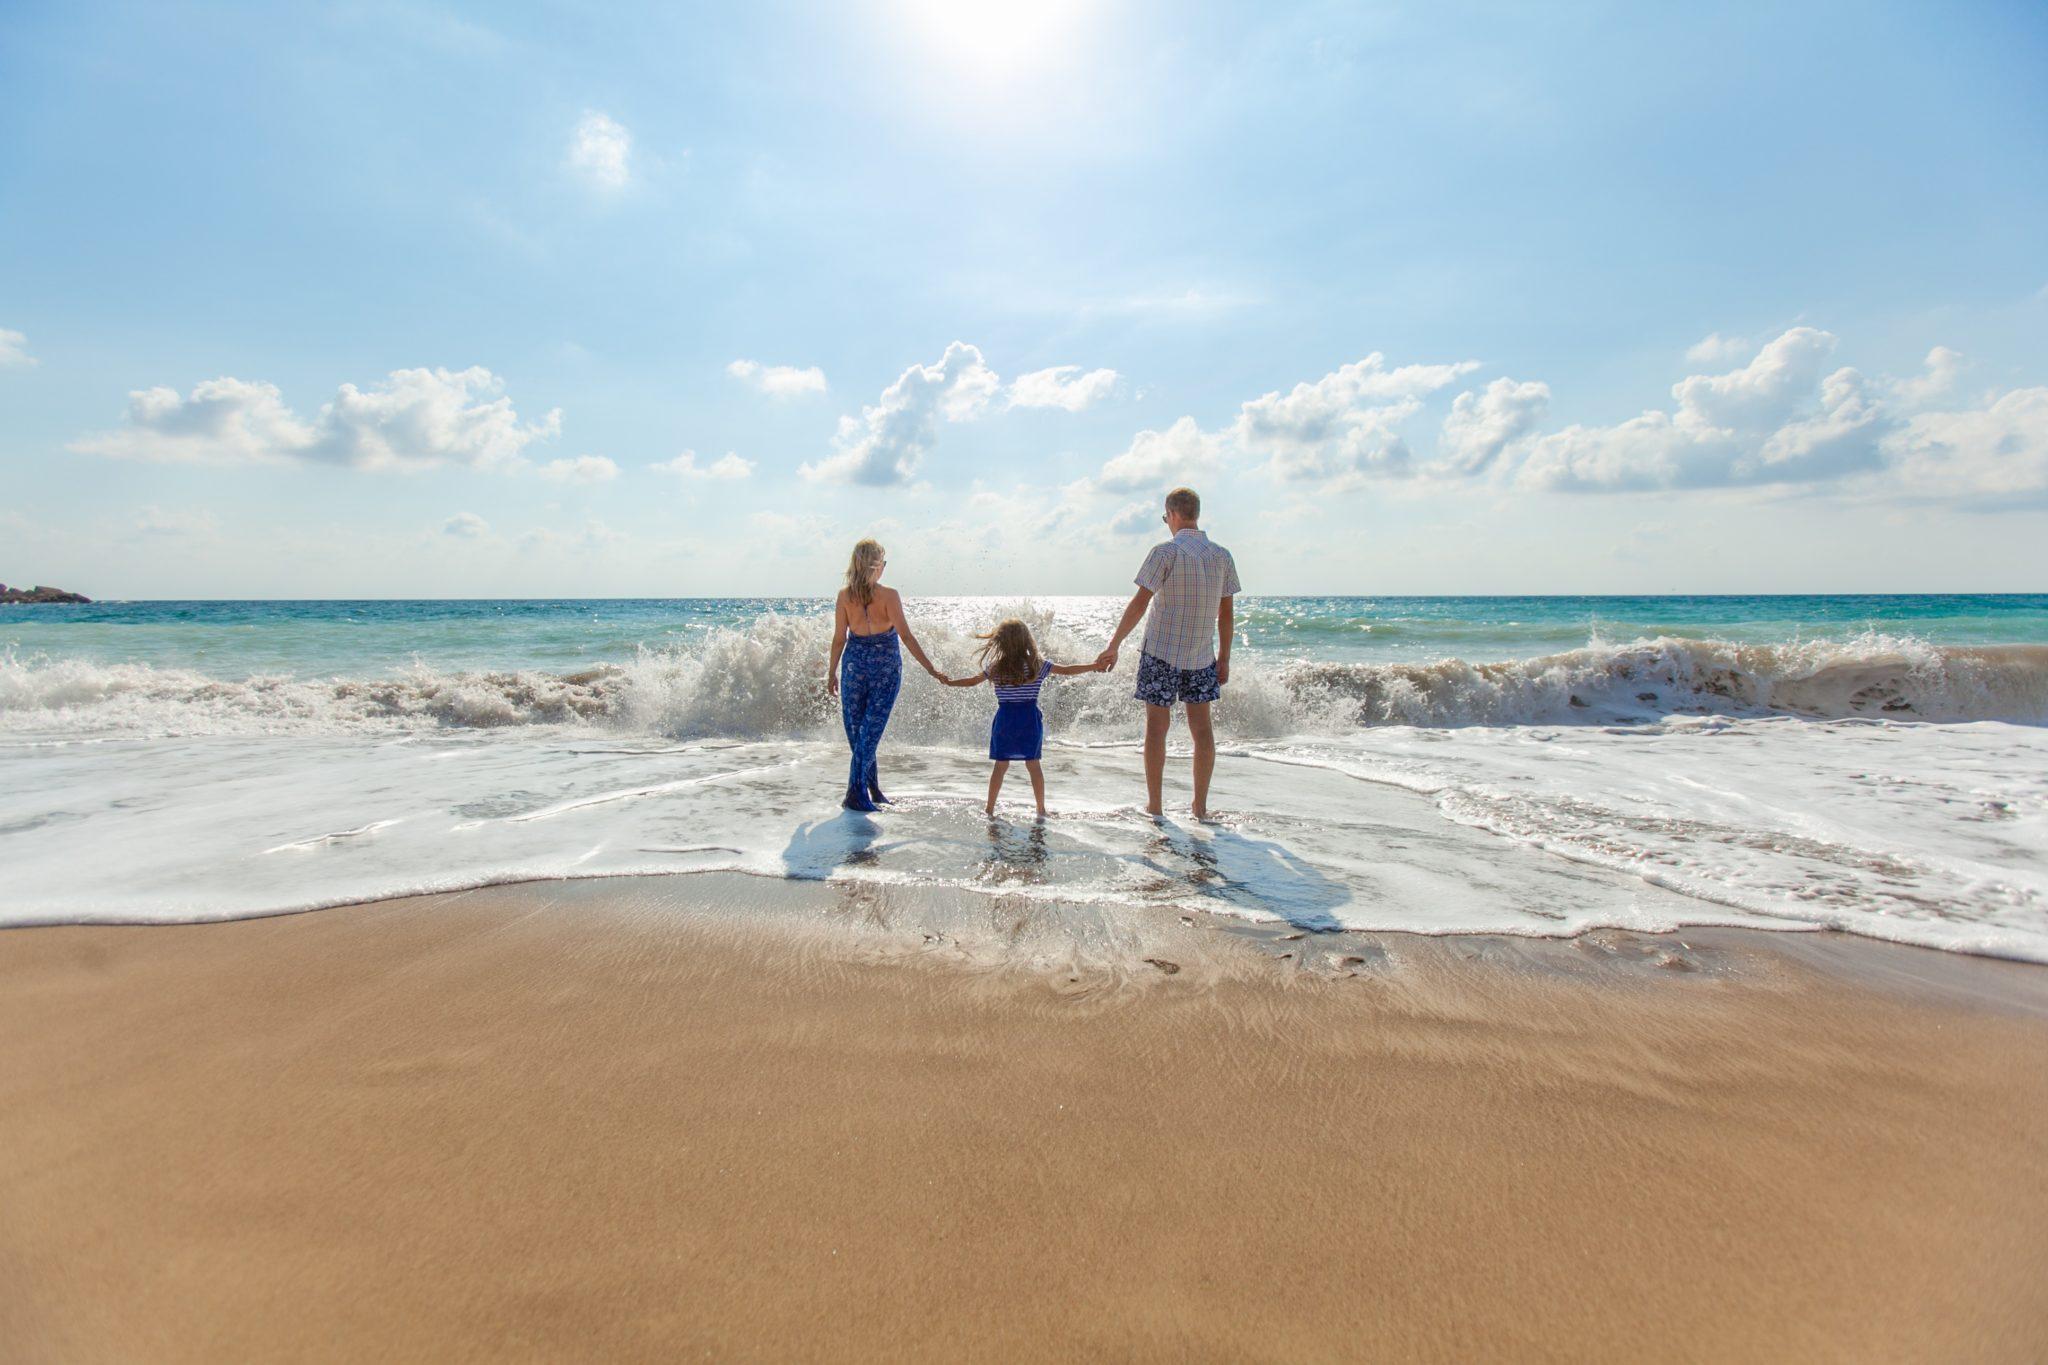 parents-kids-having-nice-day-beach